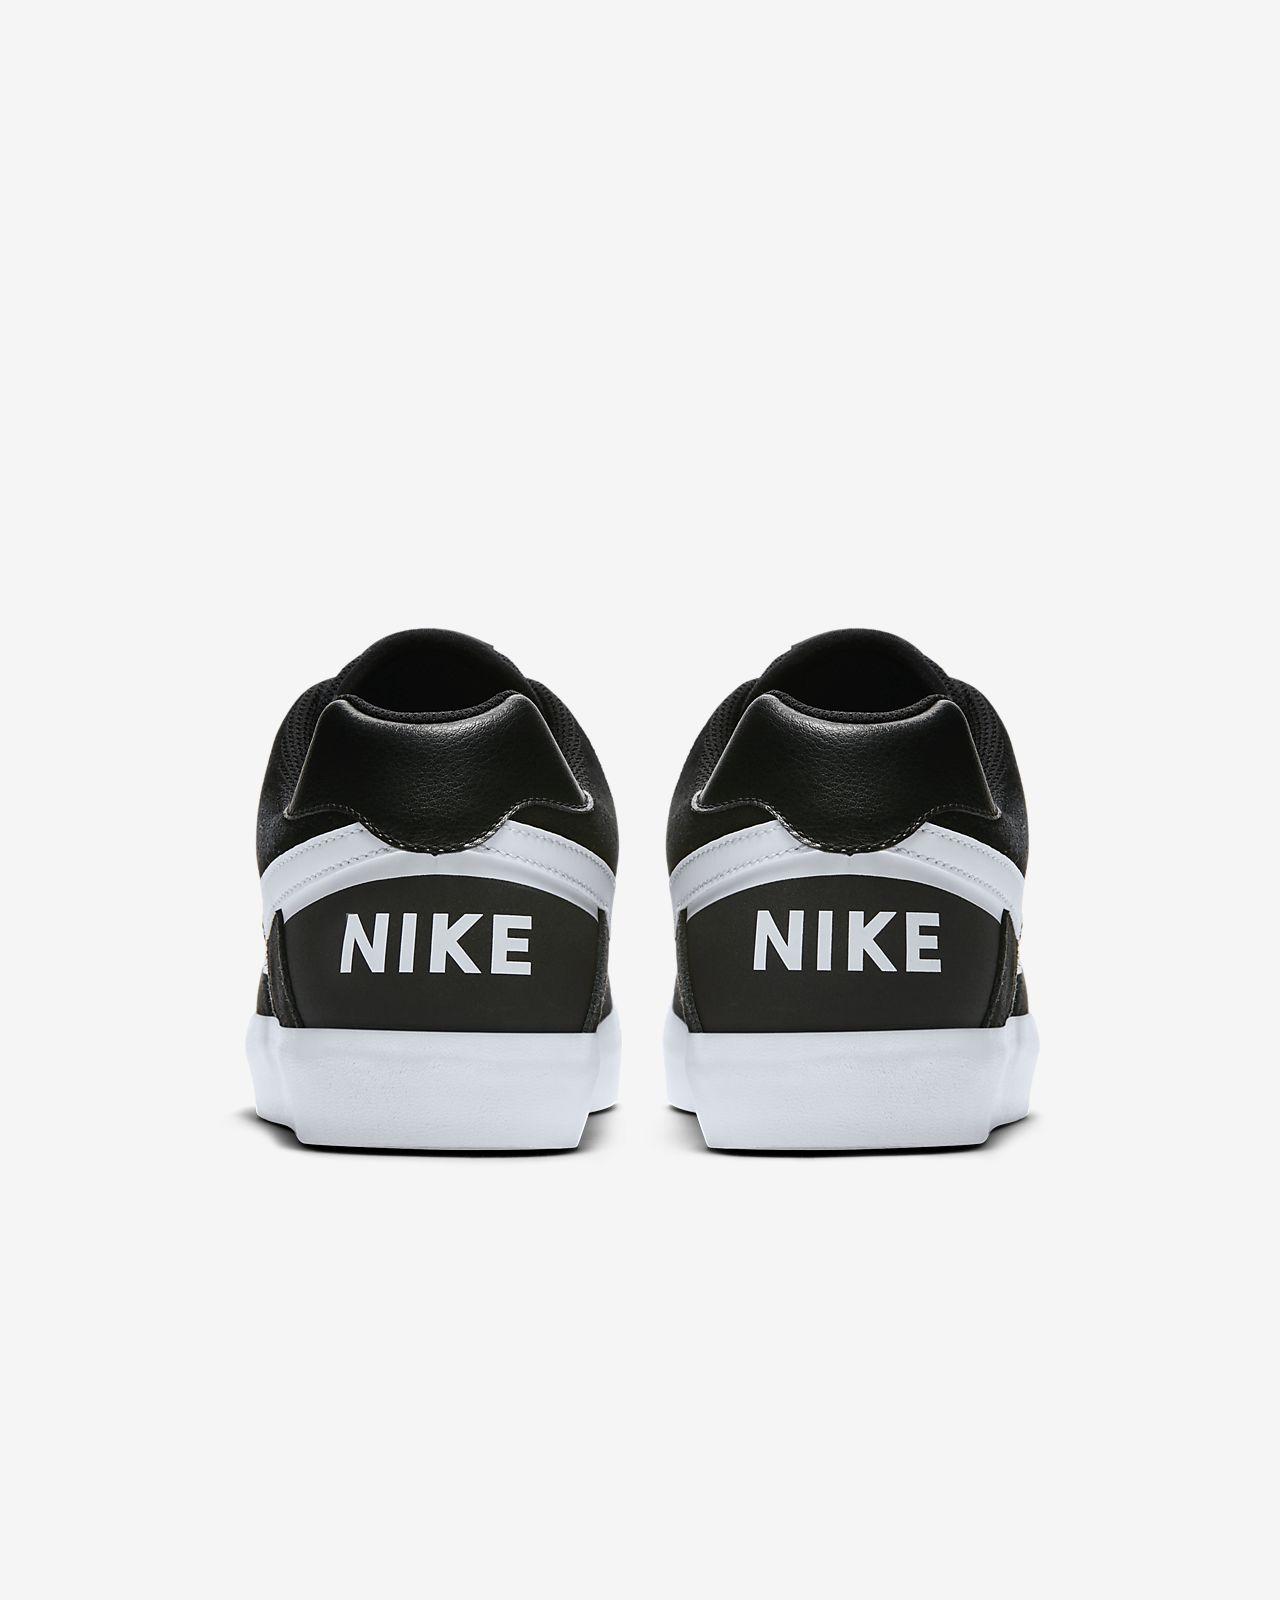 Nike Mens SB Delta Force Vulc Skateboard Shoes 942237-010 Black White